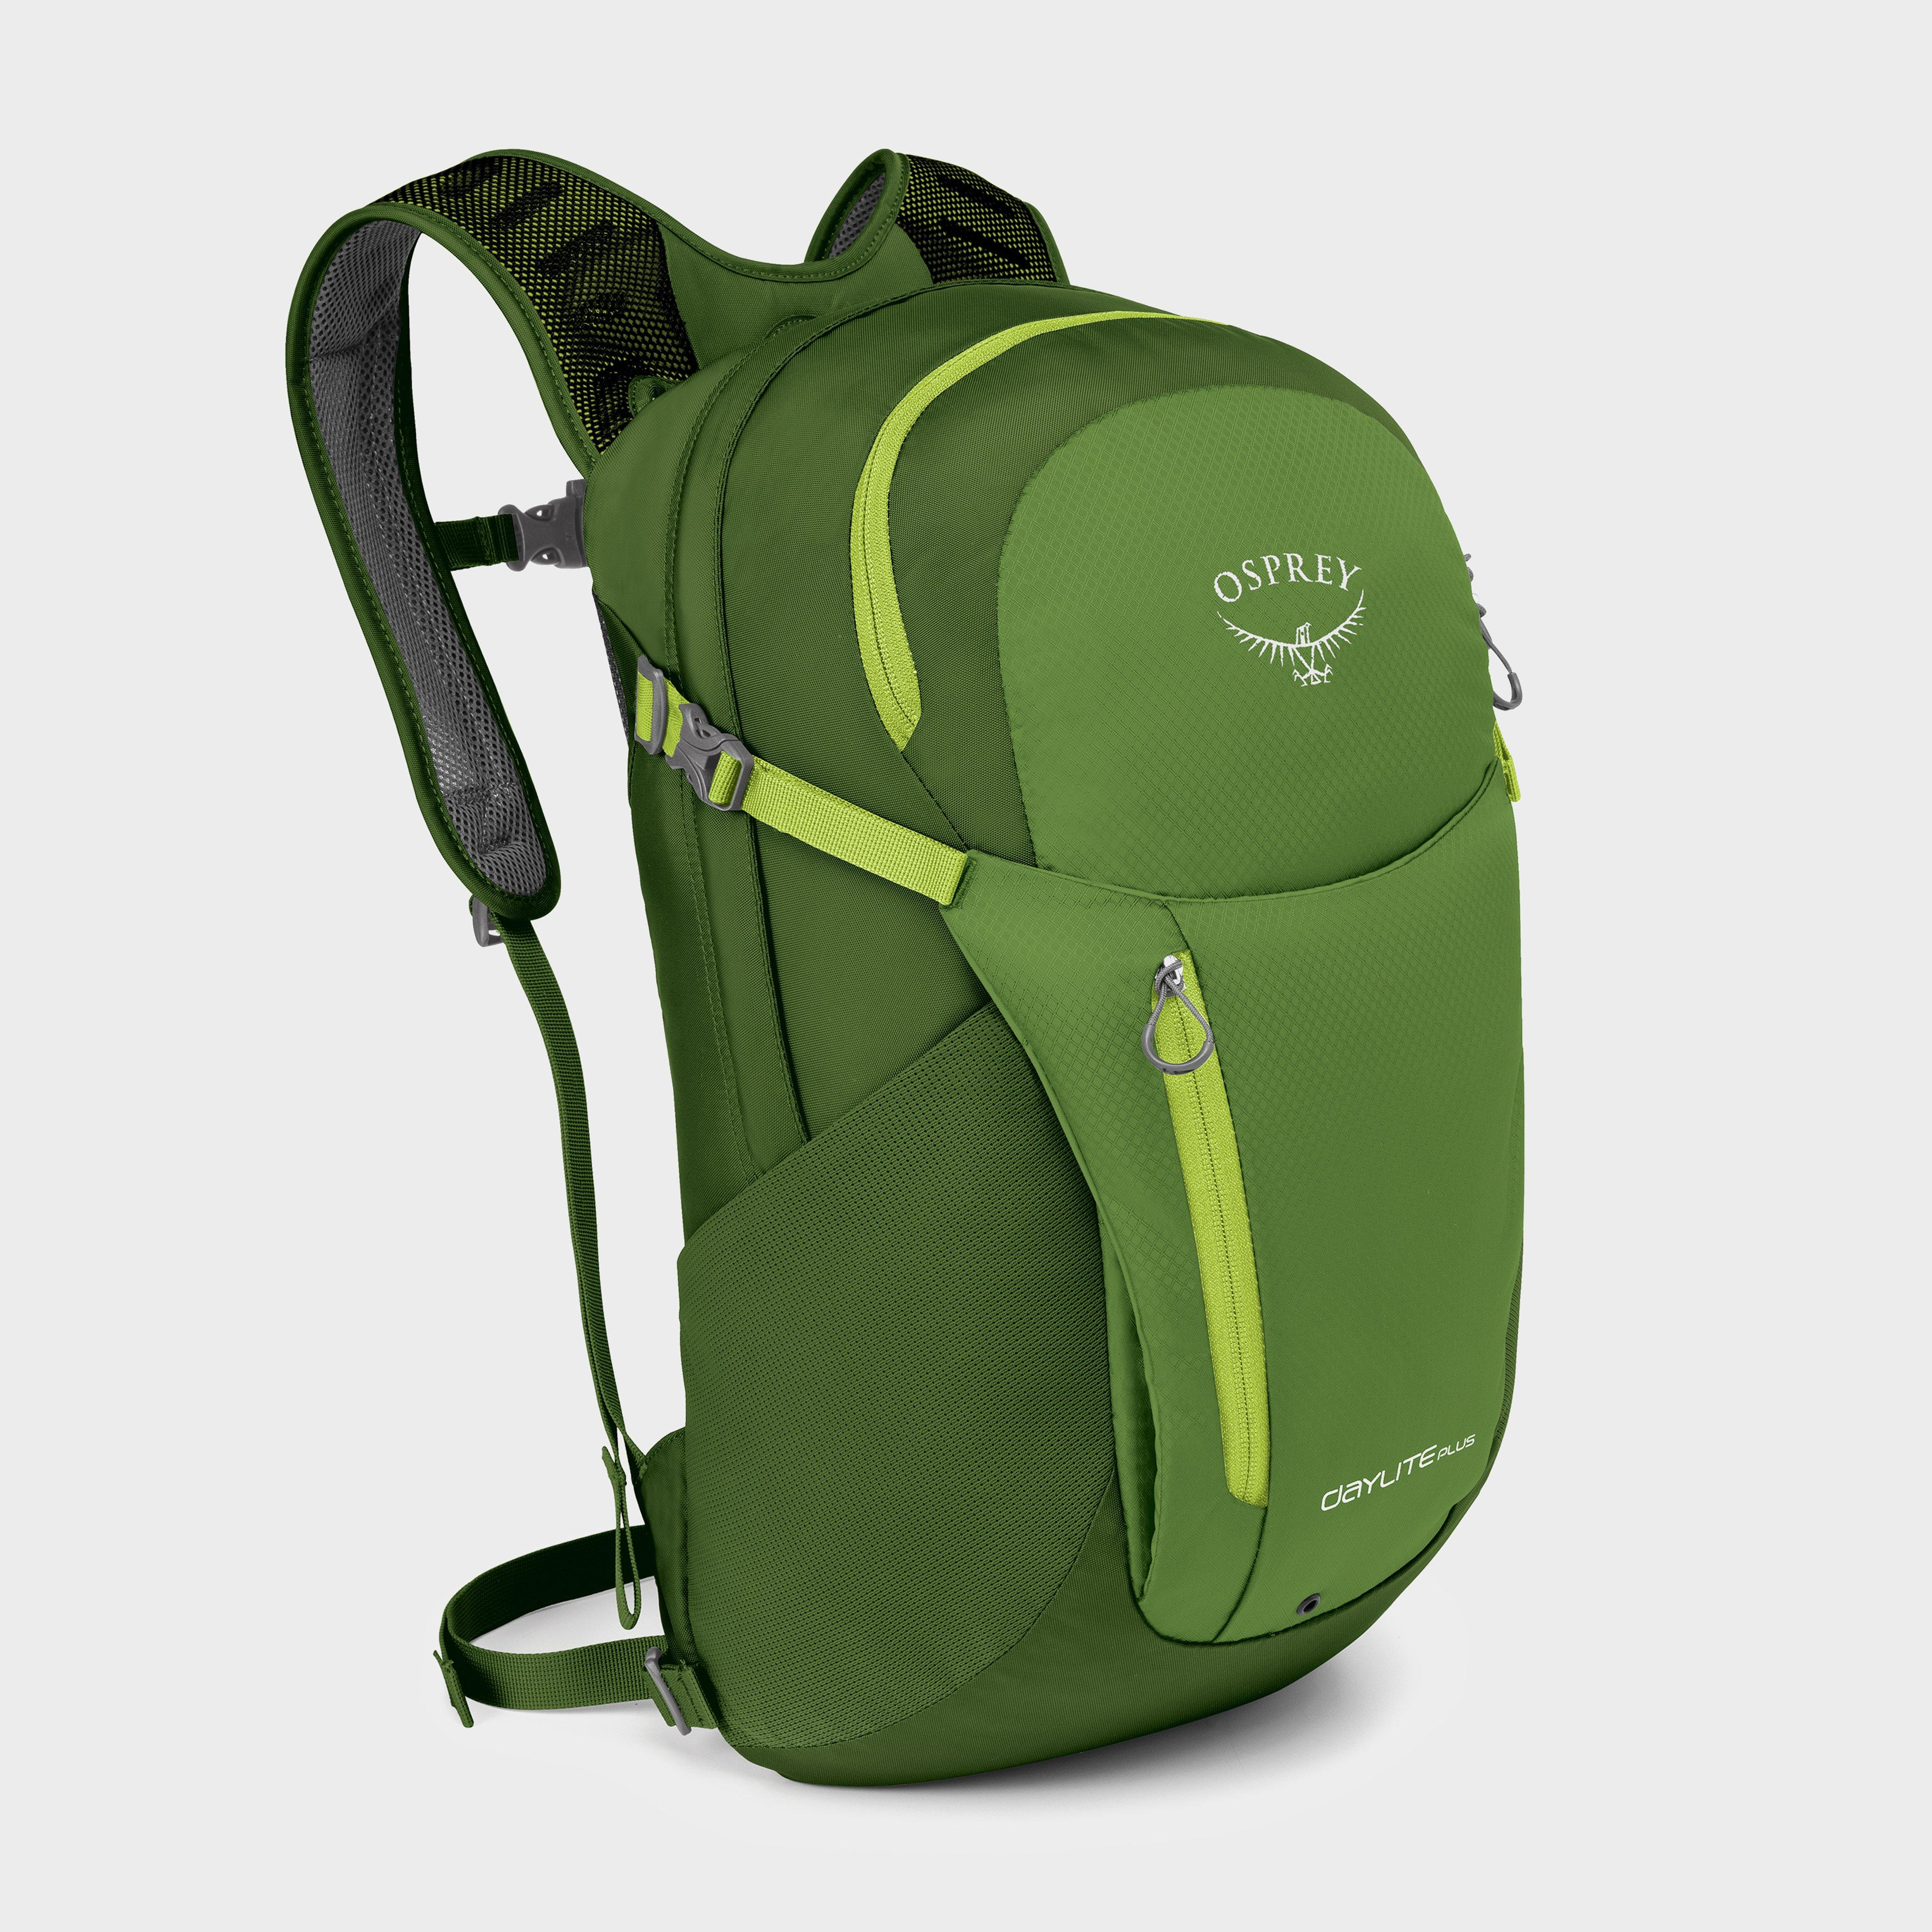 Osprey Daylite Plus 20 Daypack, Green